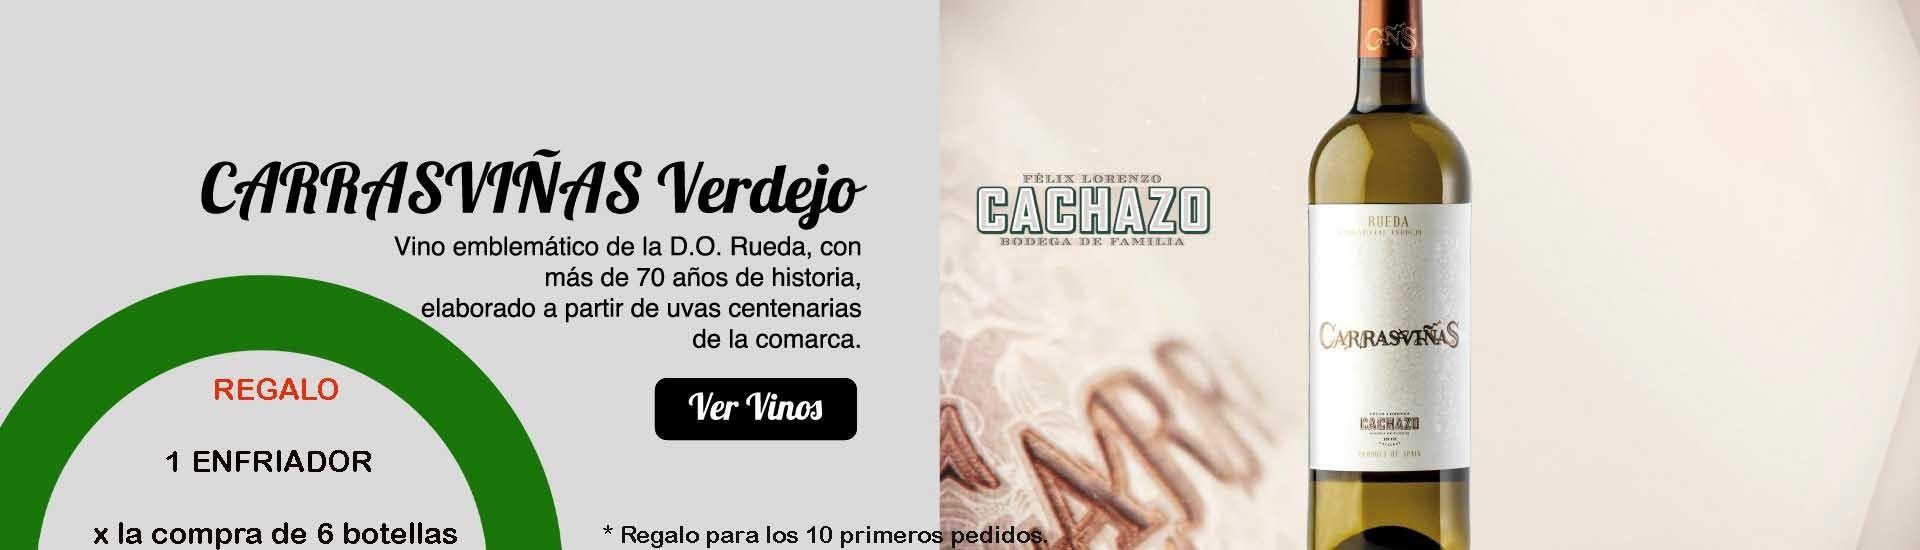 CARRASVIÑAS VERDEJO + REGALO ENFRIADOR